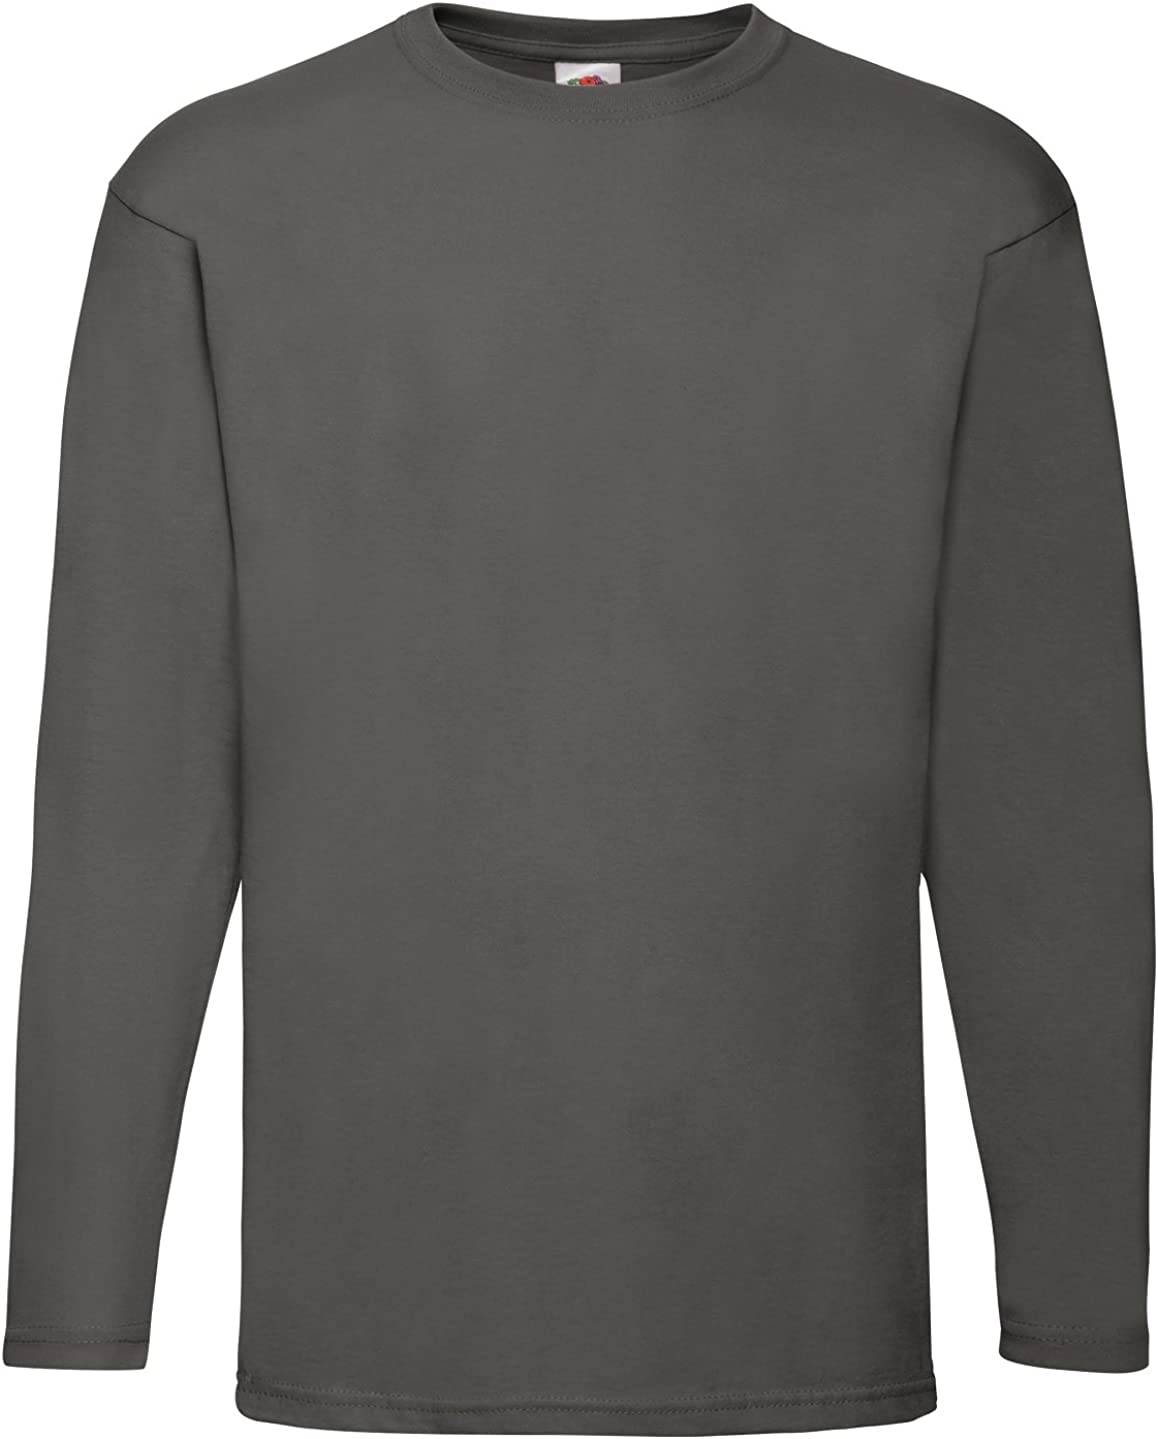 Fruit of the Loom Mens Long Sleeve Value T Shirt Light Graphite XL